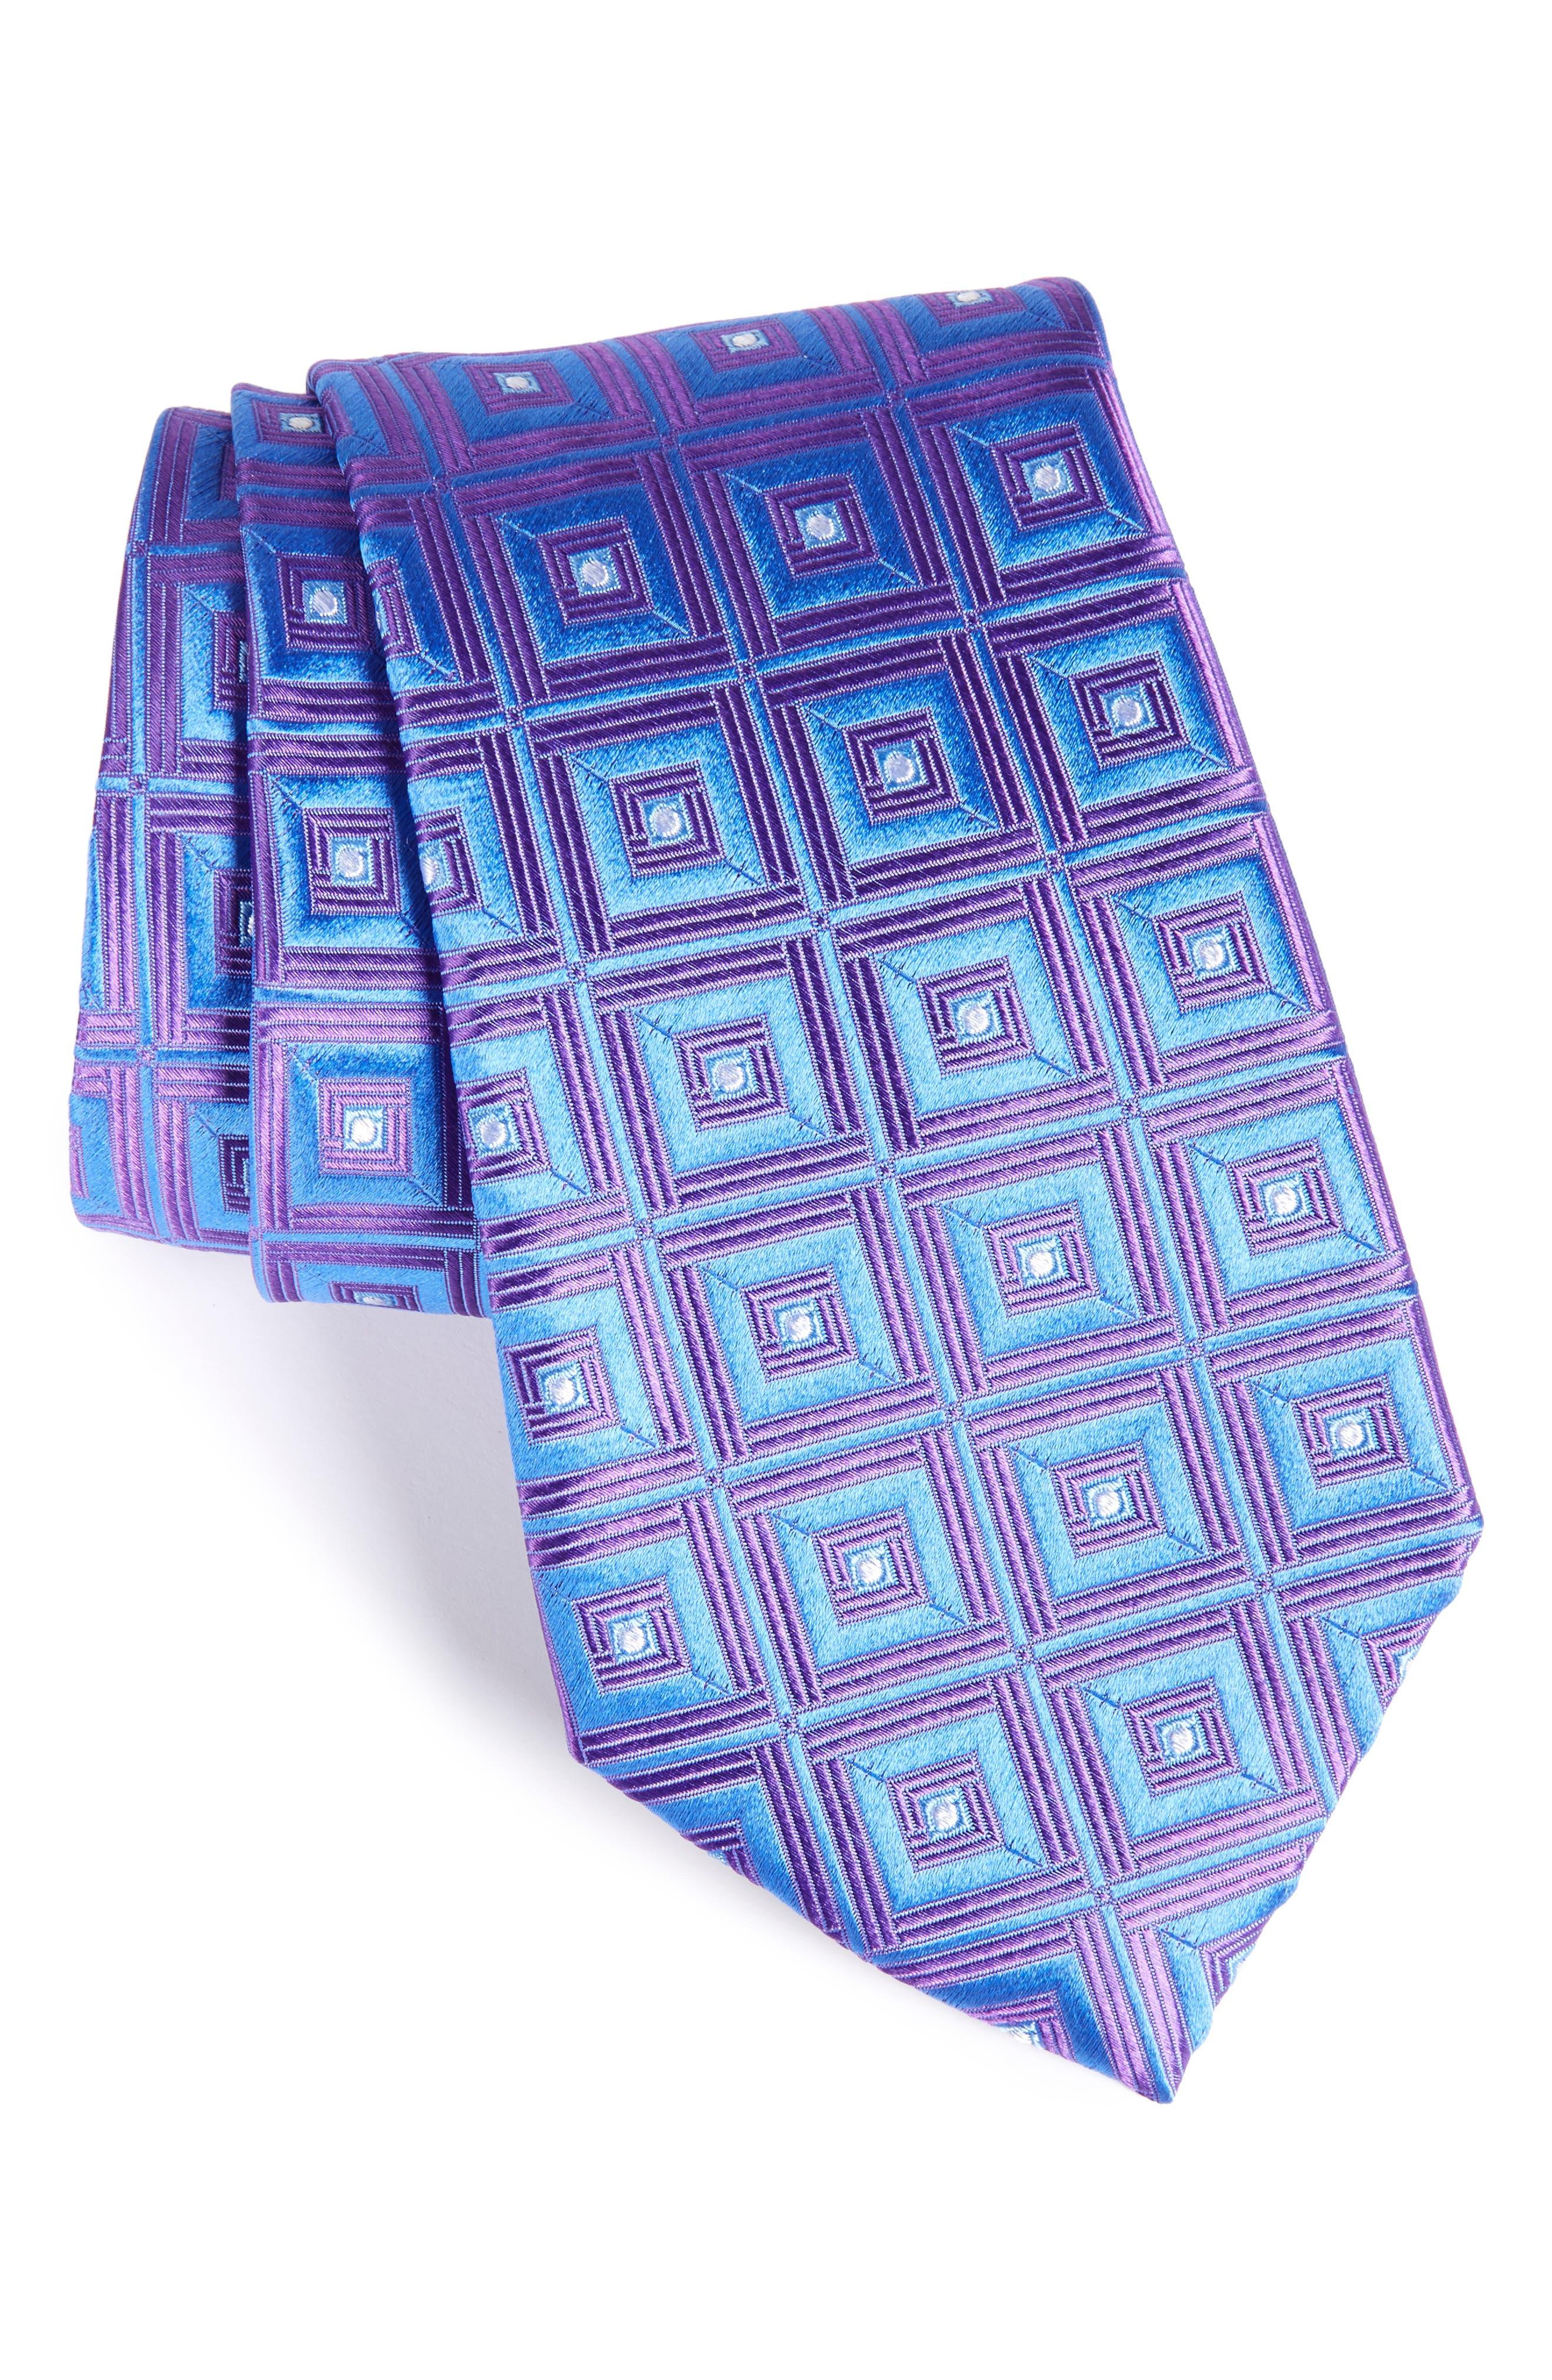 Alternate Image 1 Selected - Nordstrom Men's Shop Frame Diamonds Silk Tie (X-Long)